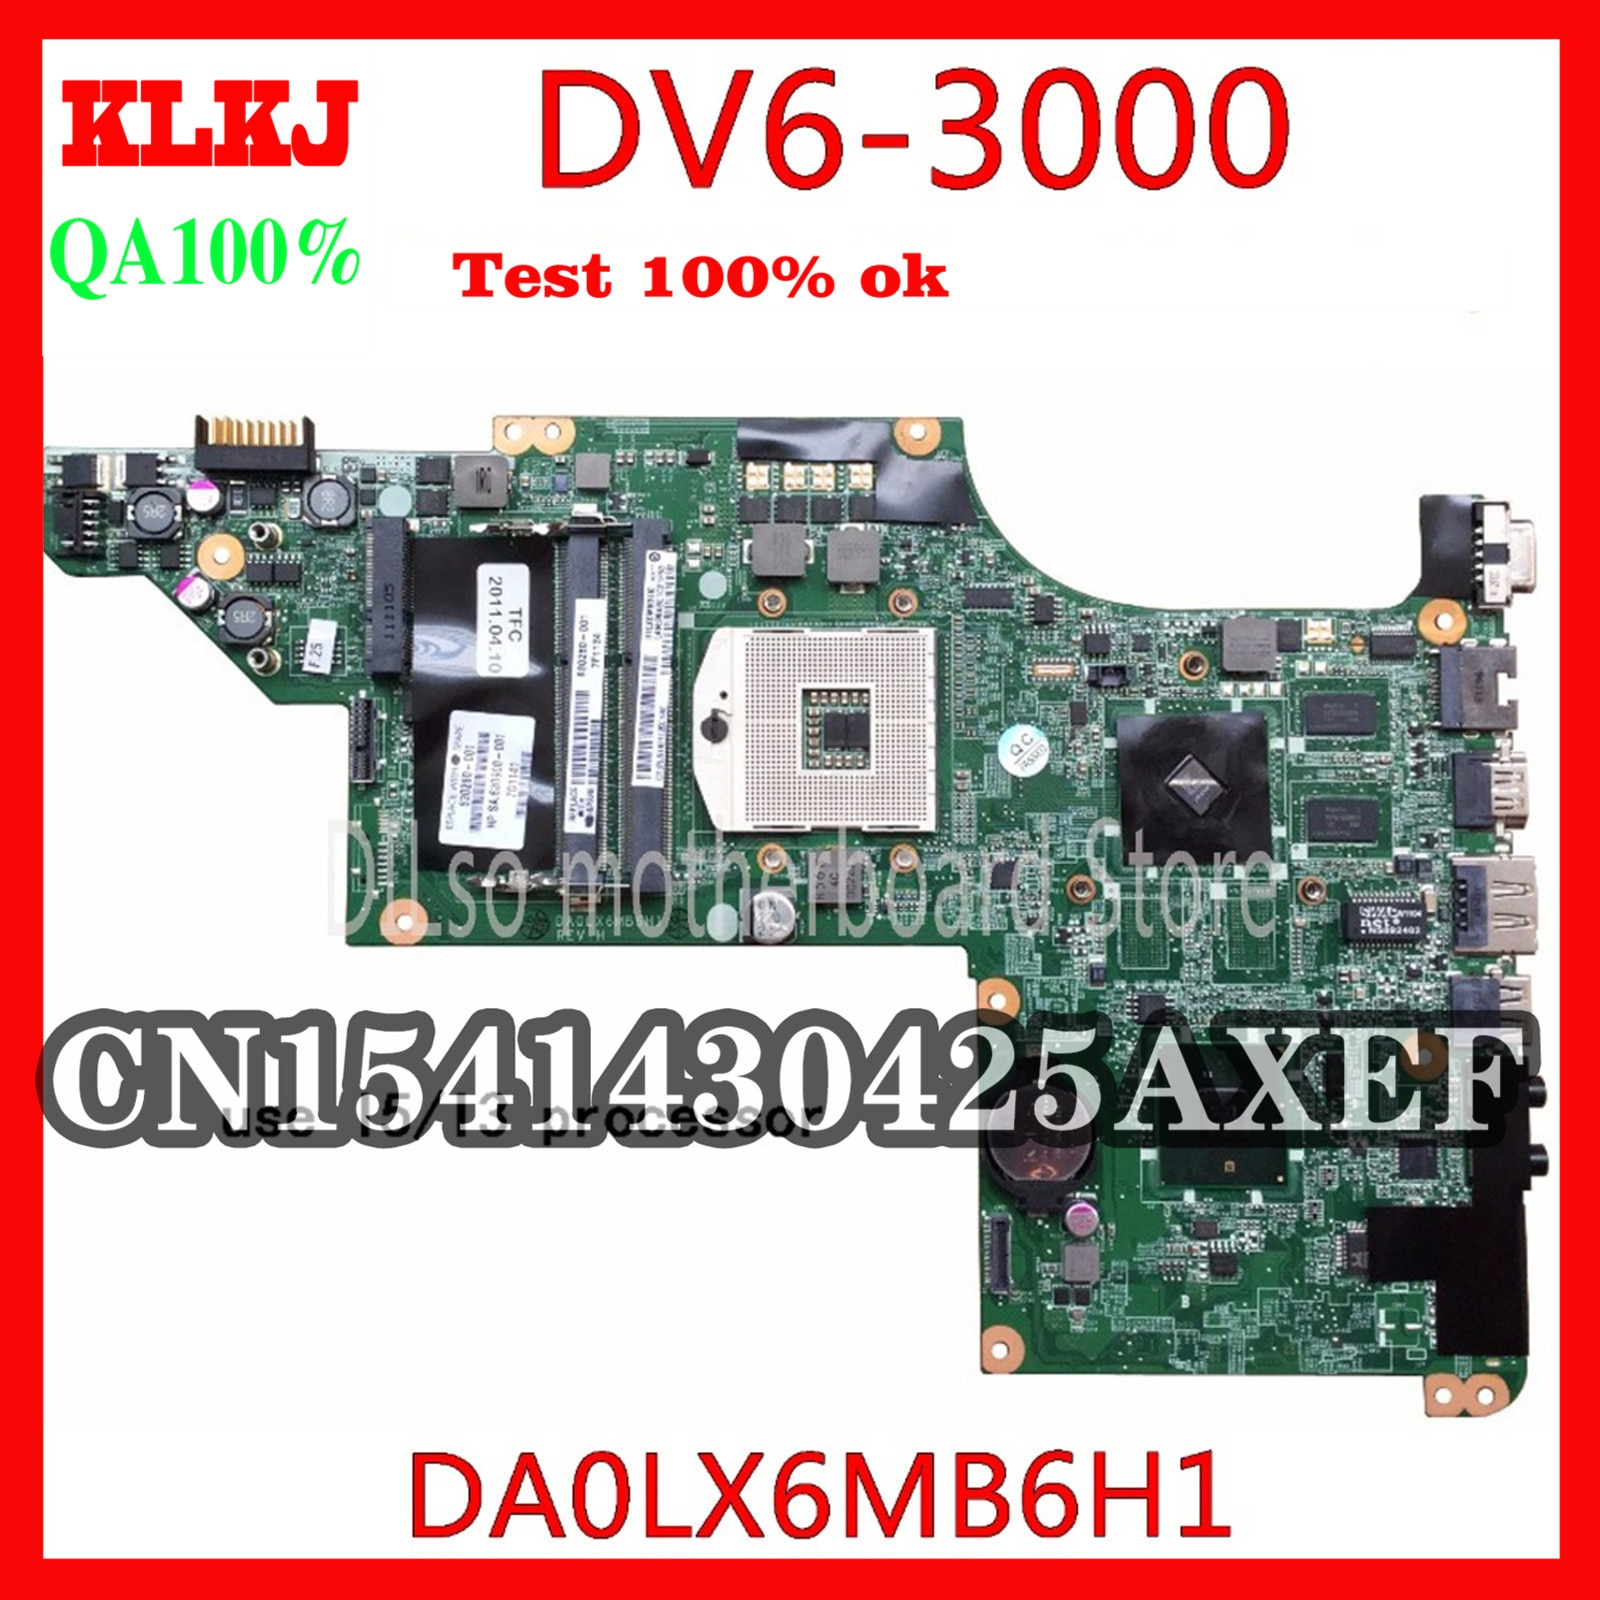 KLKJ 615280-001 ل HP DV6 DV6-3000 اللوحة المحمول DA0LX6MB6G1 DA0LX6MB6H1 اختبار الأصلي 100% العمل